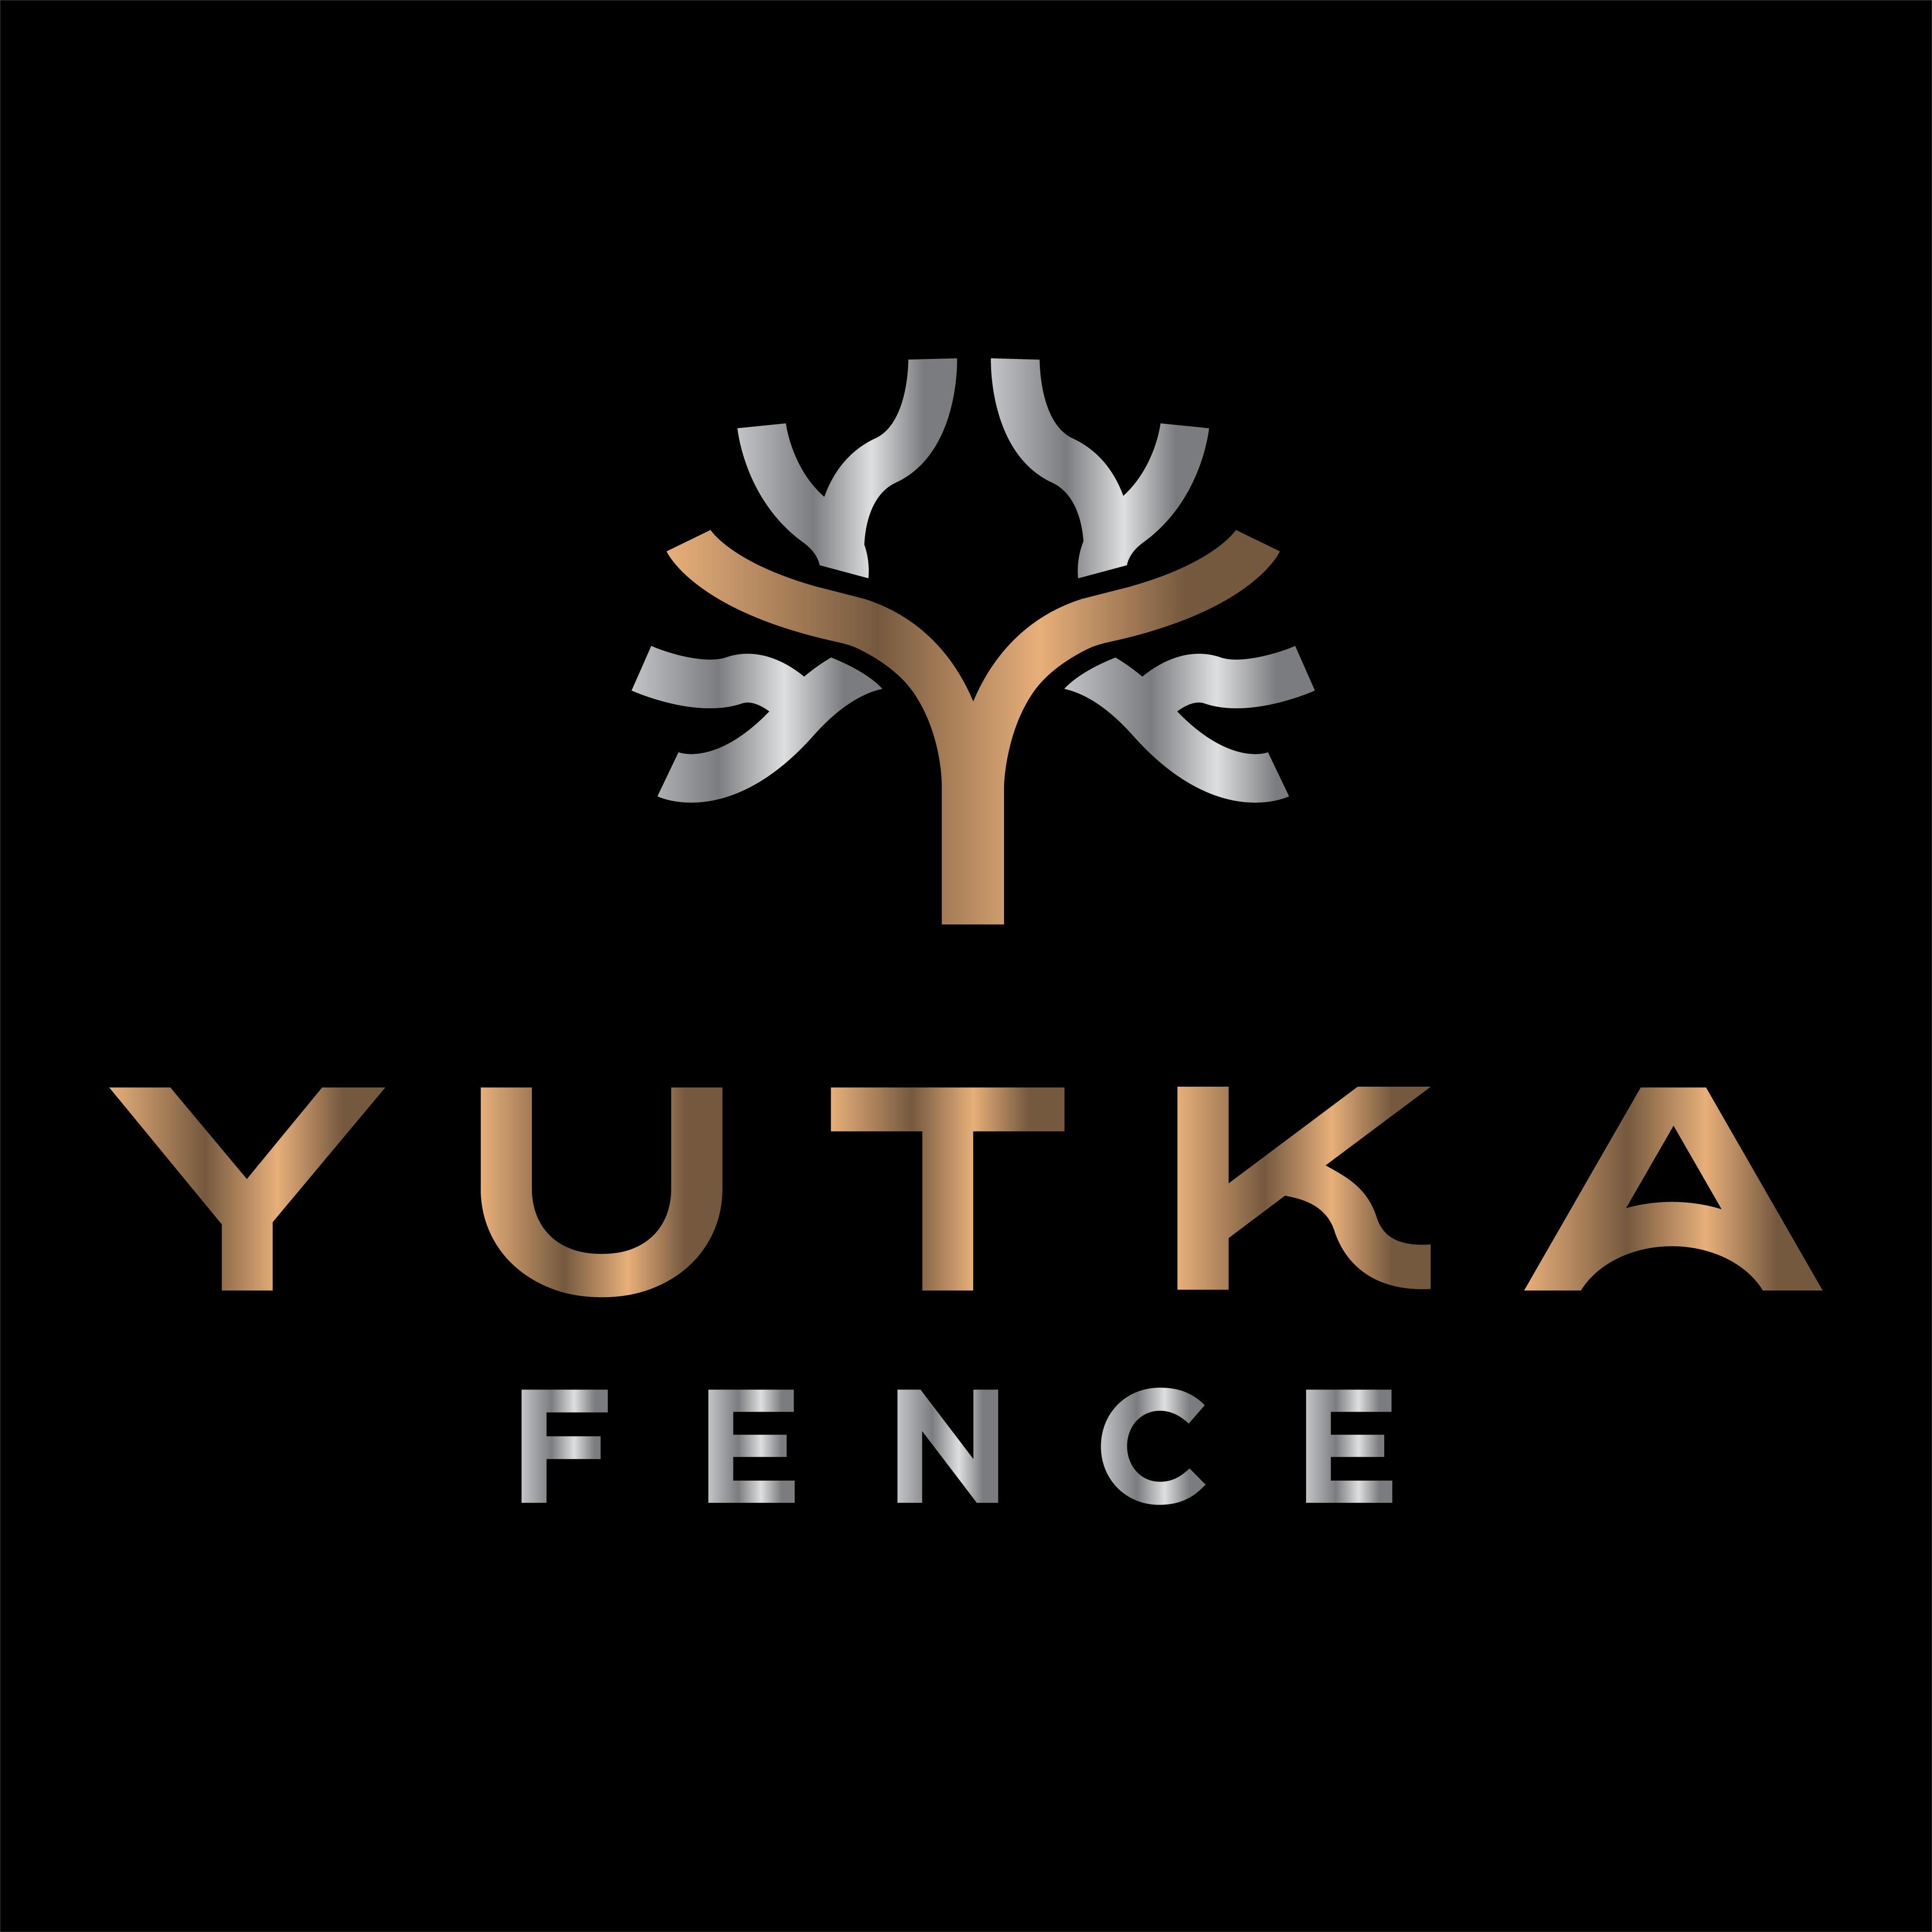 Yutka Fence